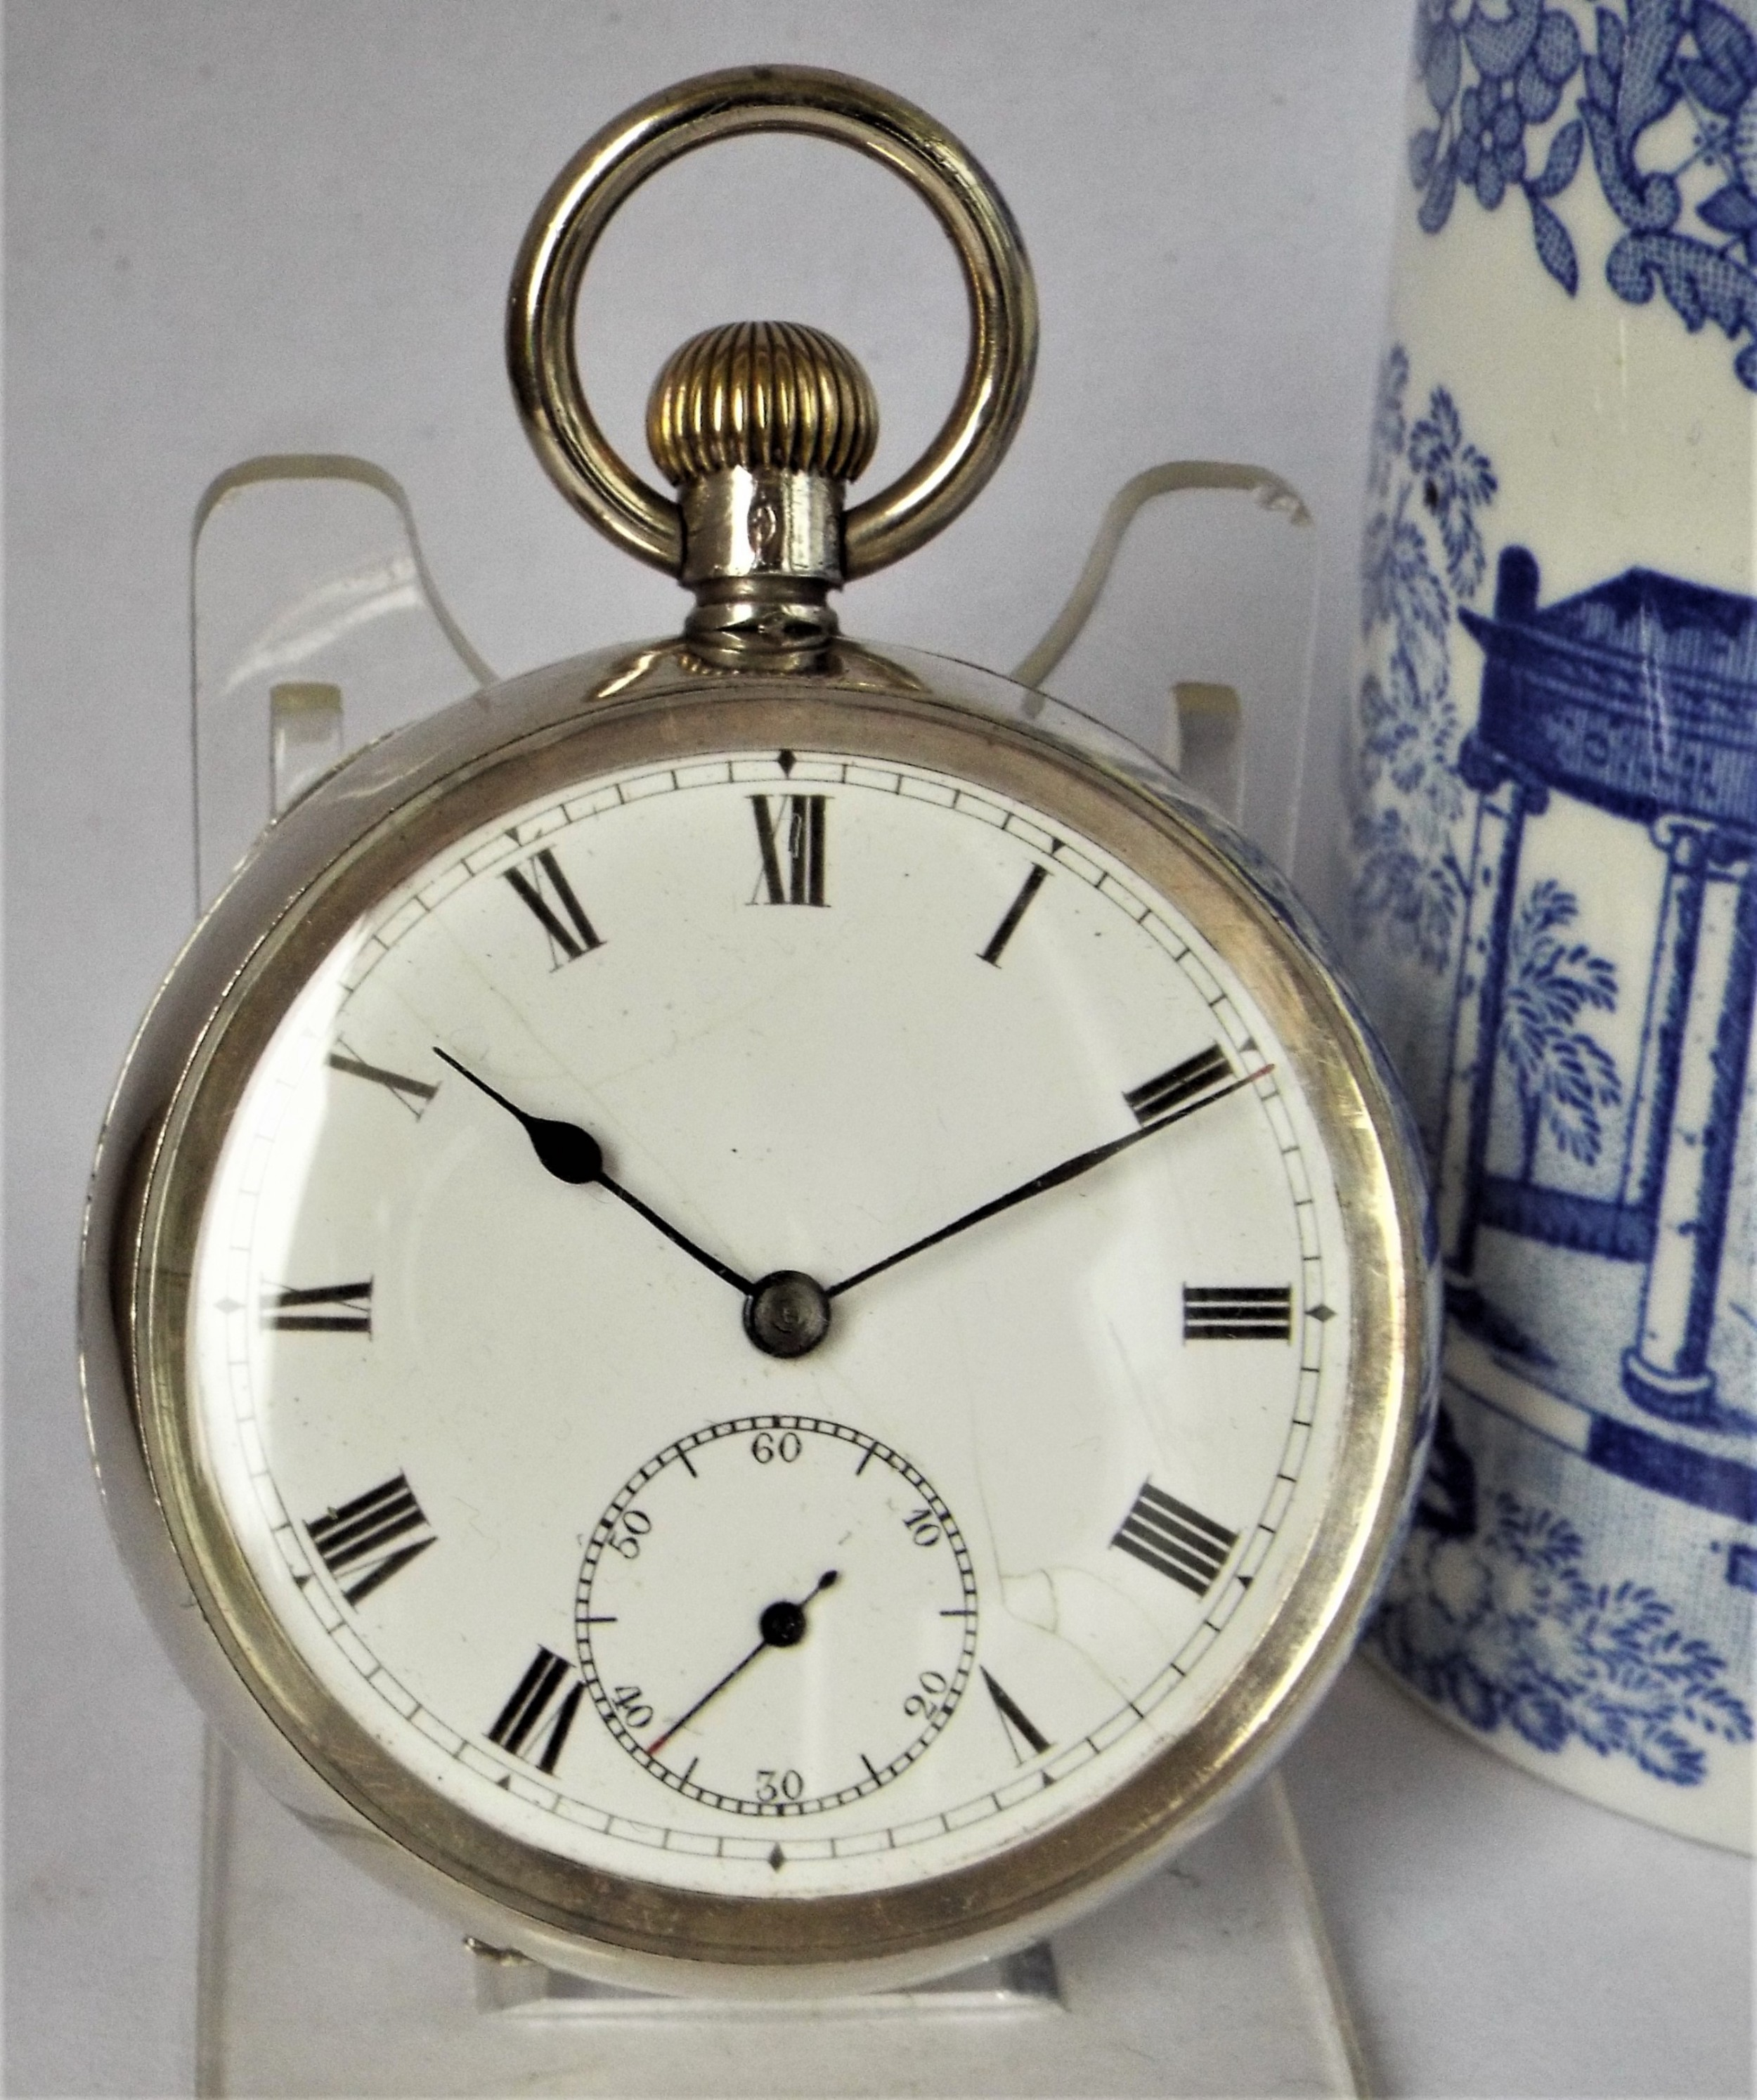 antique silver stem winding pocket watch 1919